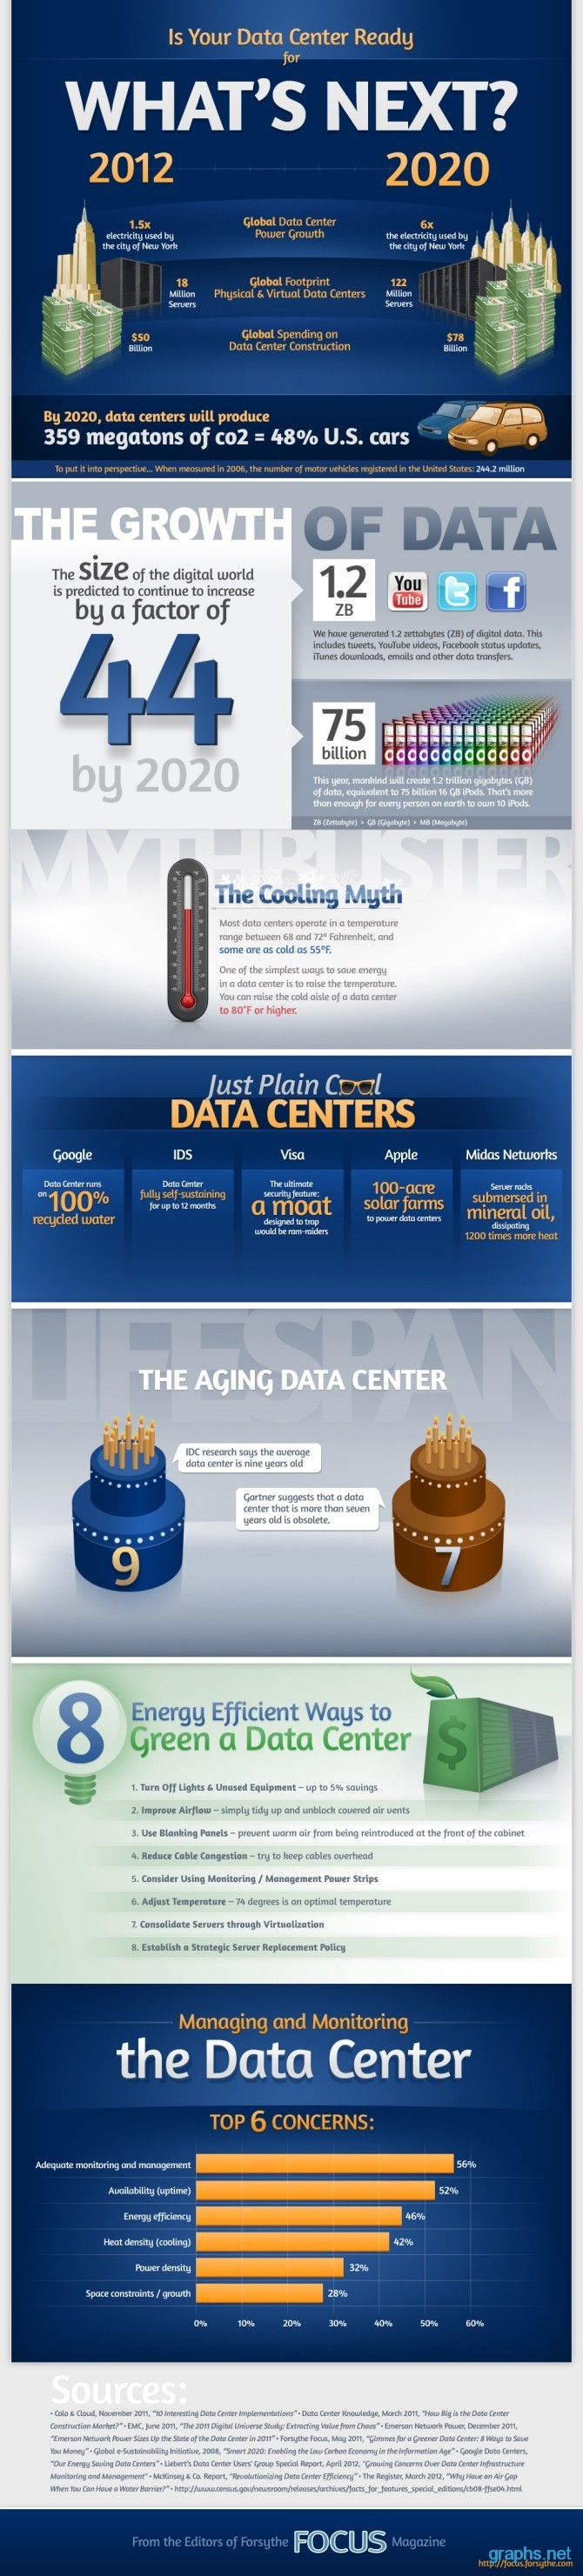 Future of Data Center